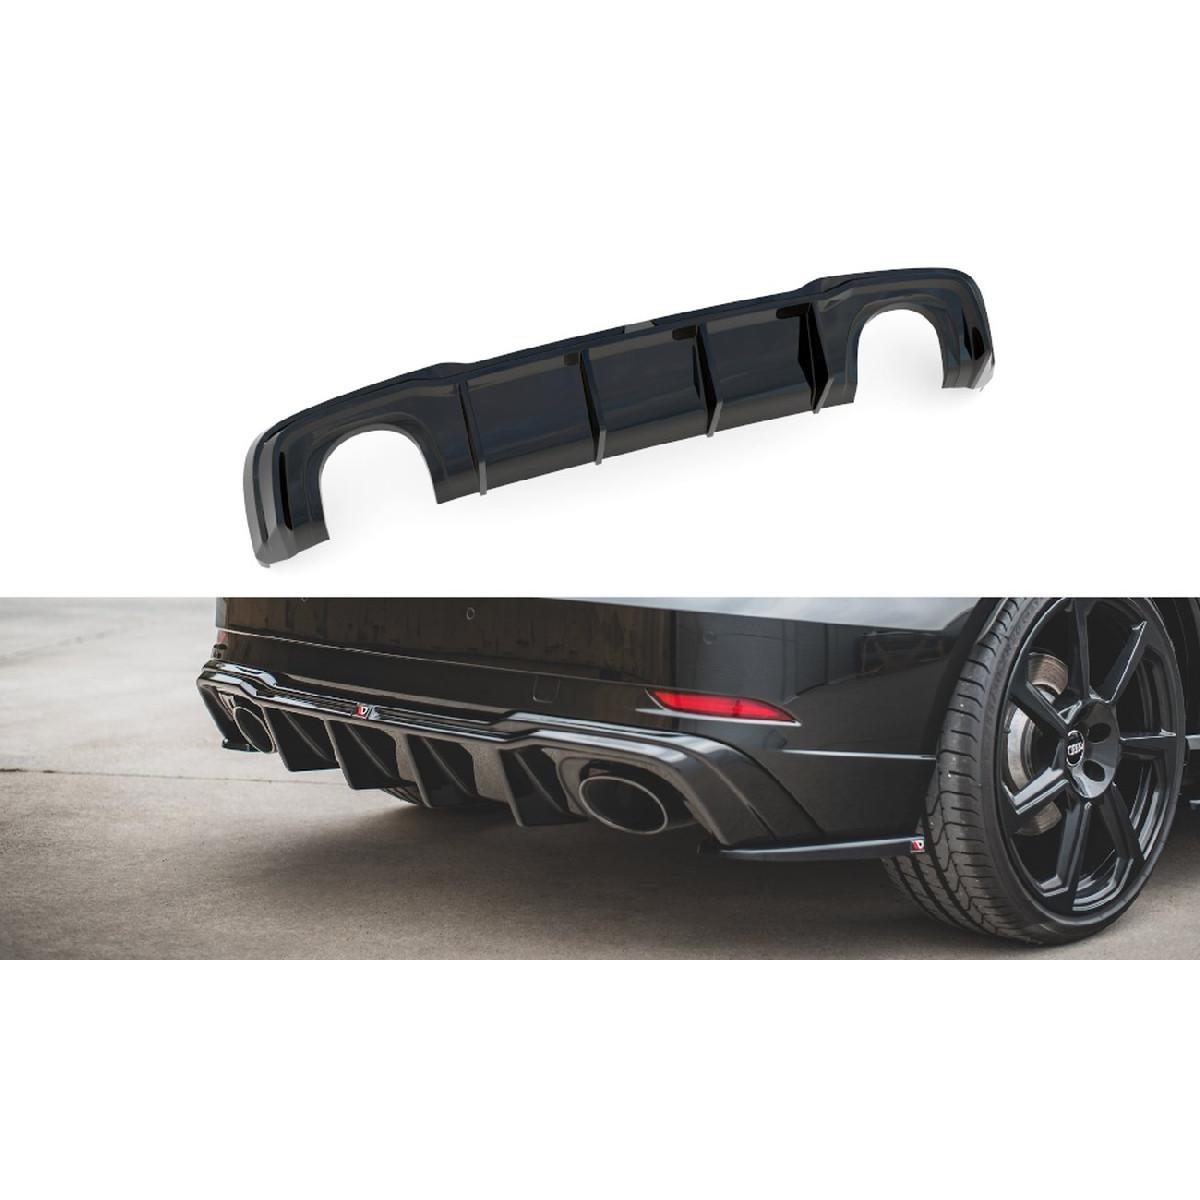 Heck Ansatz Diffusor V.2 für Audi RS3 8V Sportback Facelift schwarz matt